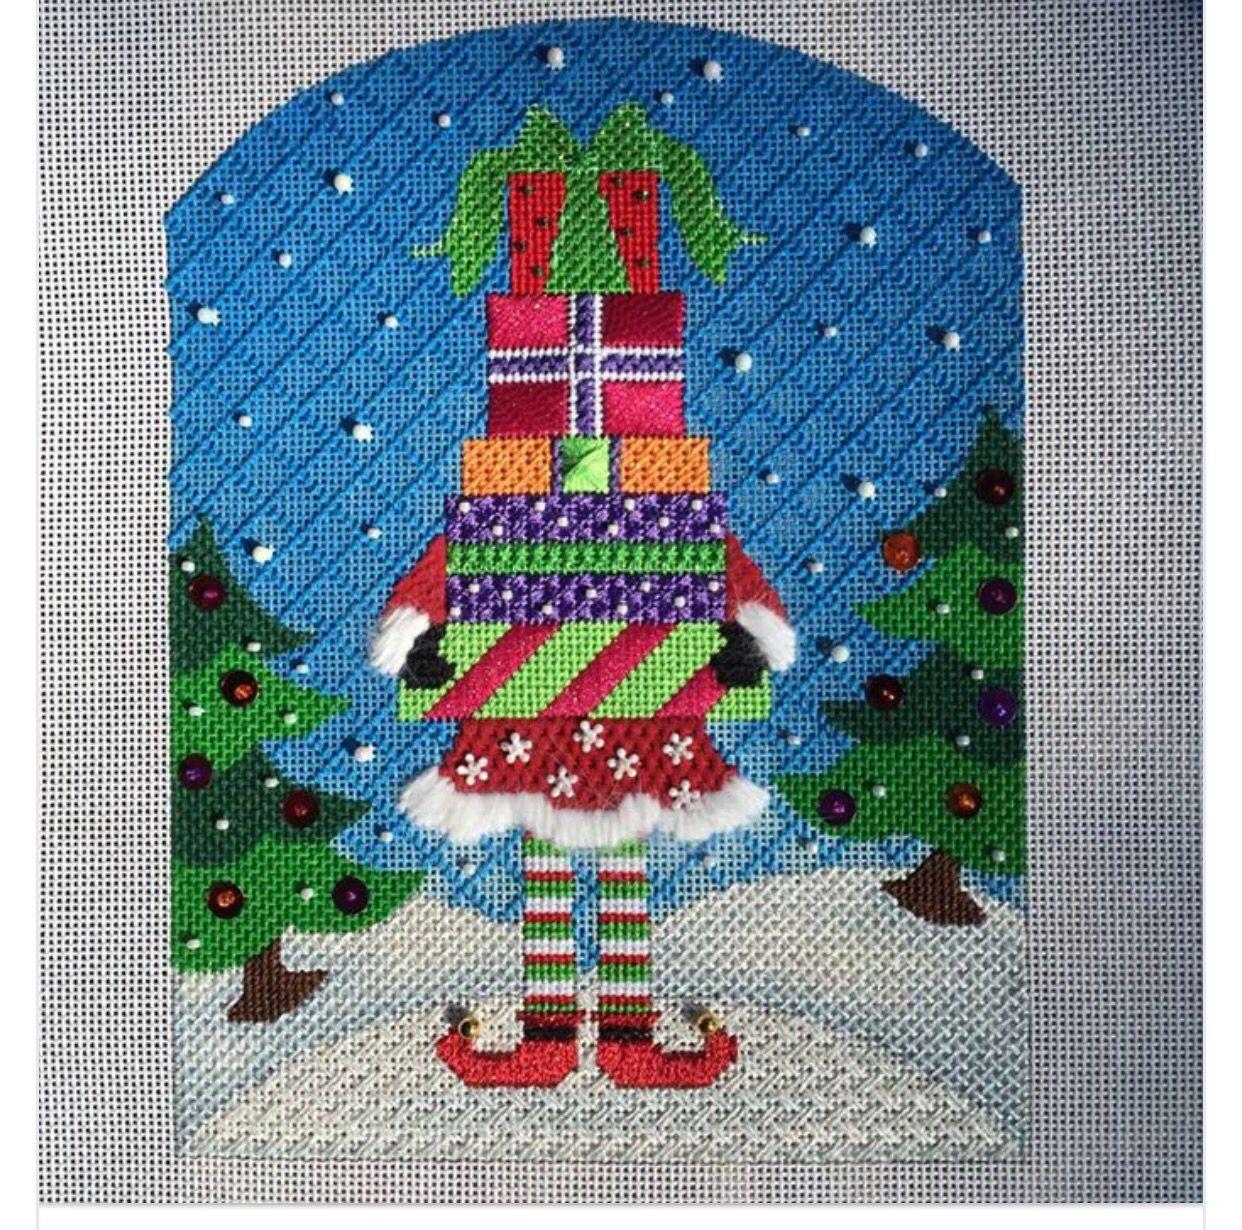 cb1dfc210120835c97cf8228978c5c06 Pepperberry Designs Gingerbread House on hydrangea designs, giraffe designs, roses designs,